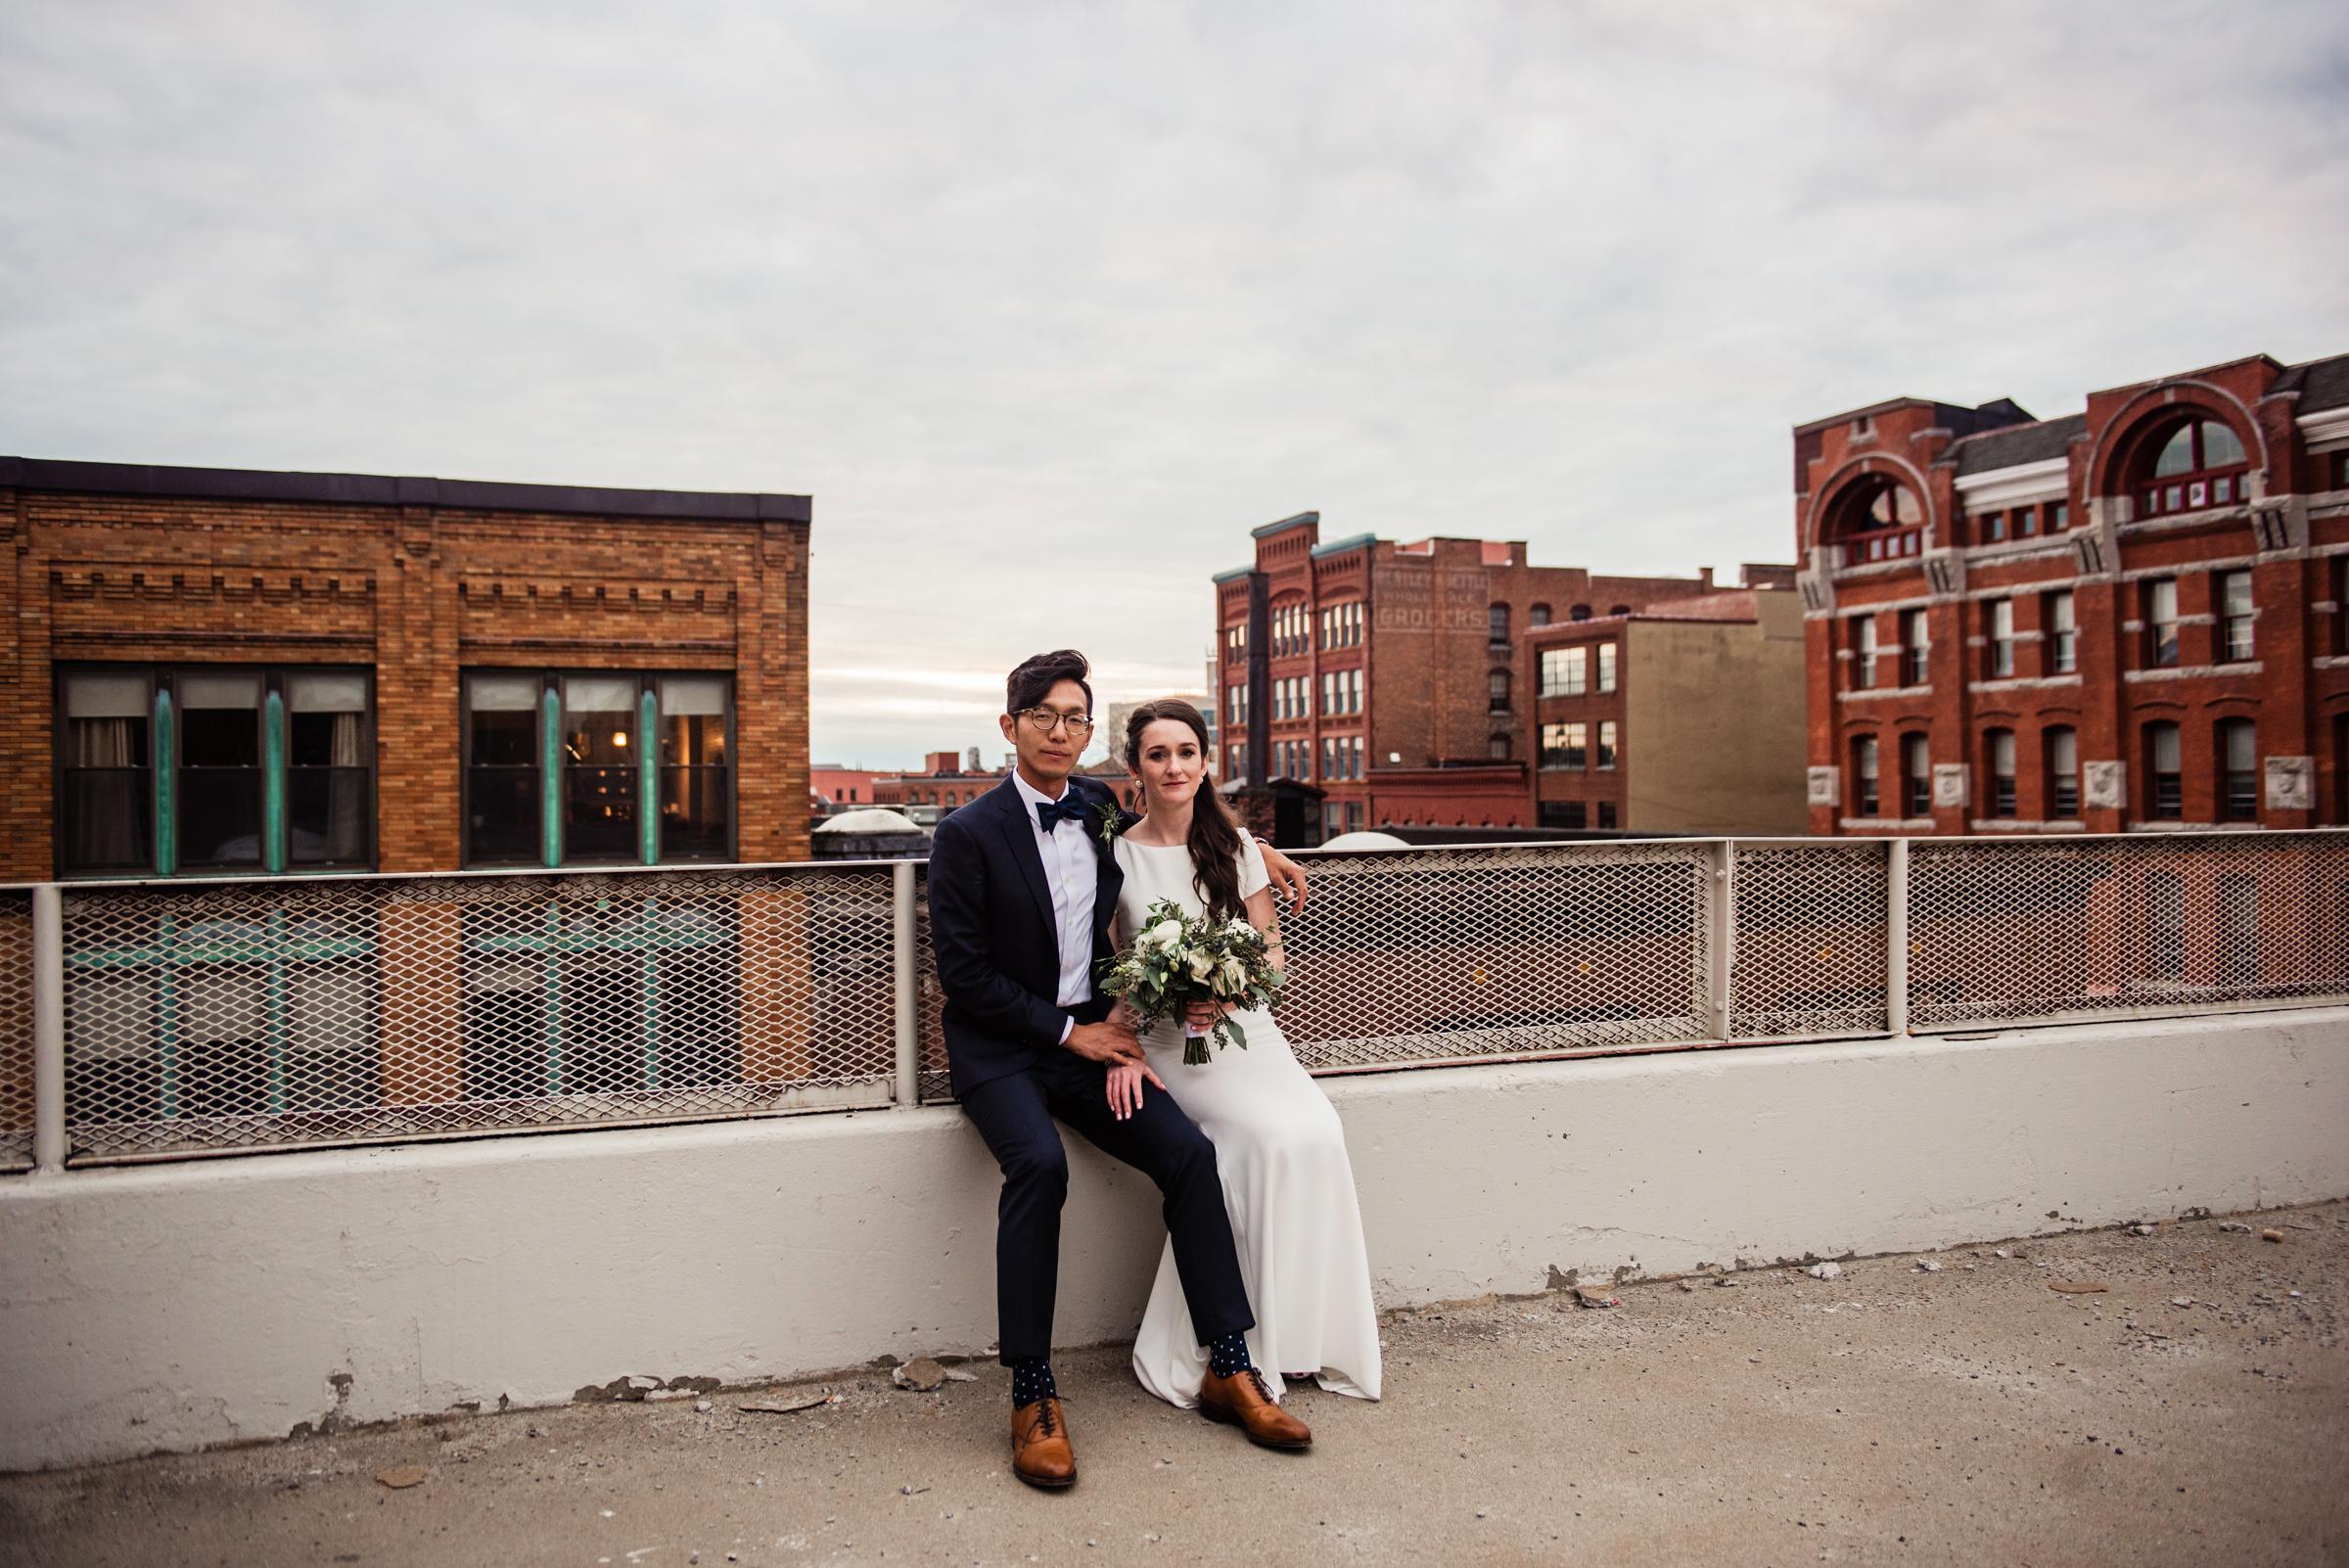 SKY_Armory_Syracuse_Wedding_JILL_STUDIO_Rochester_NY_Photographer_DSC_6242.jpg